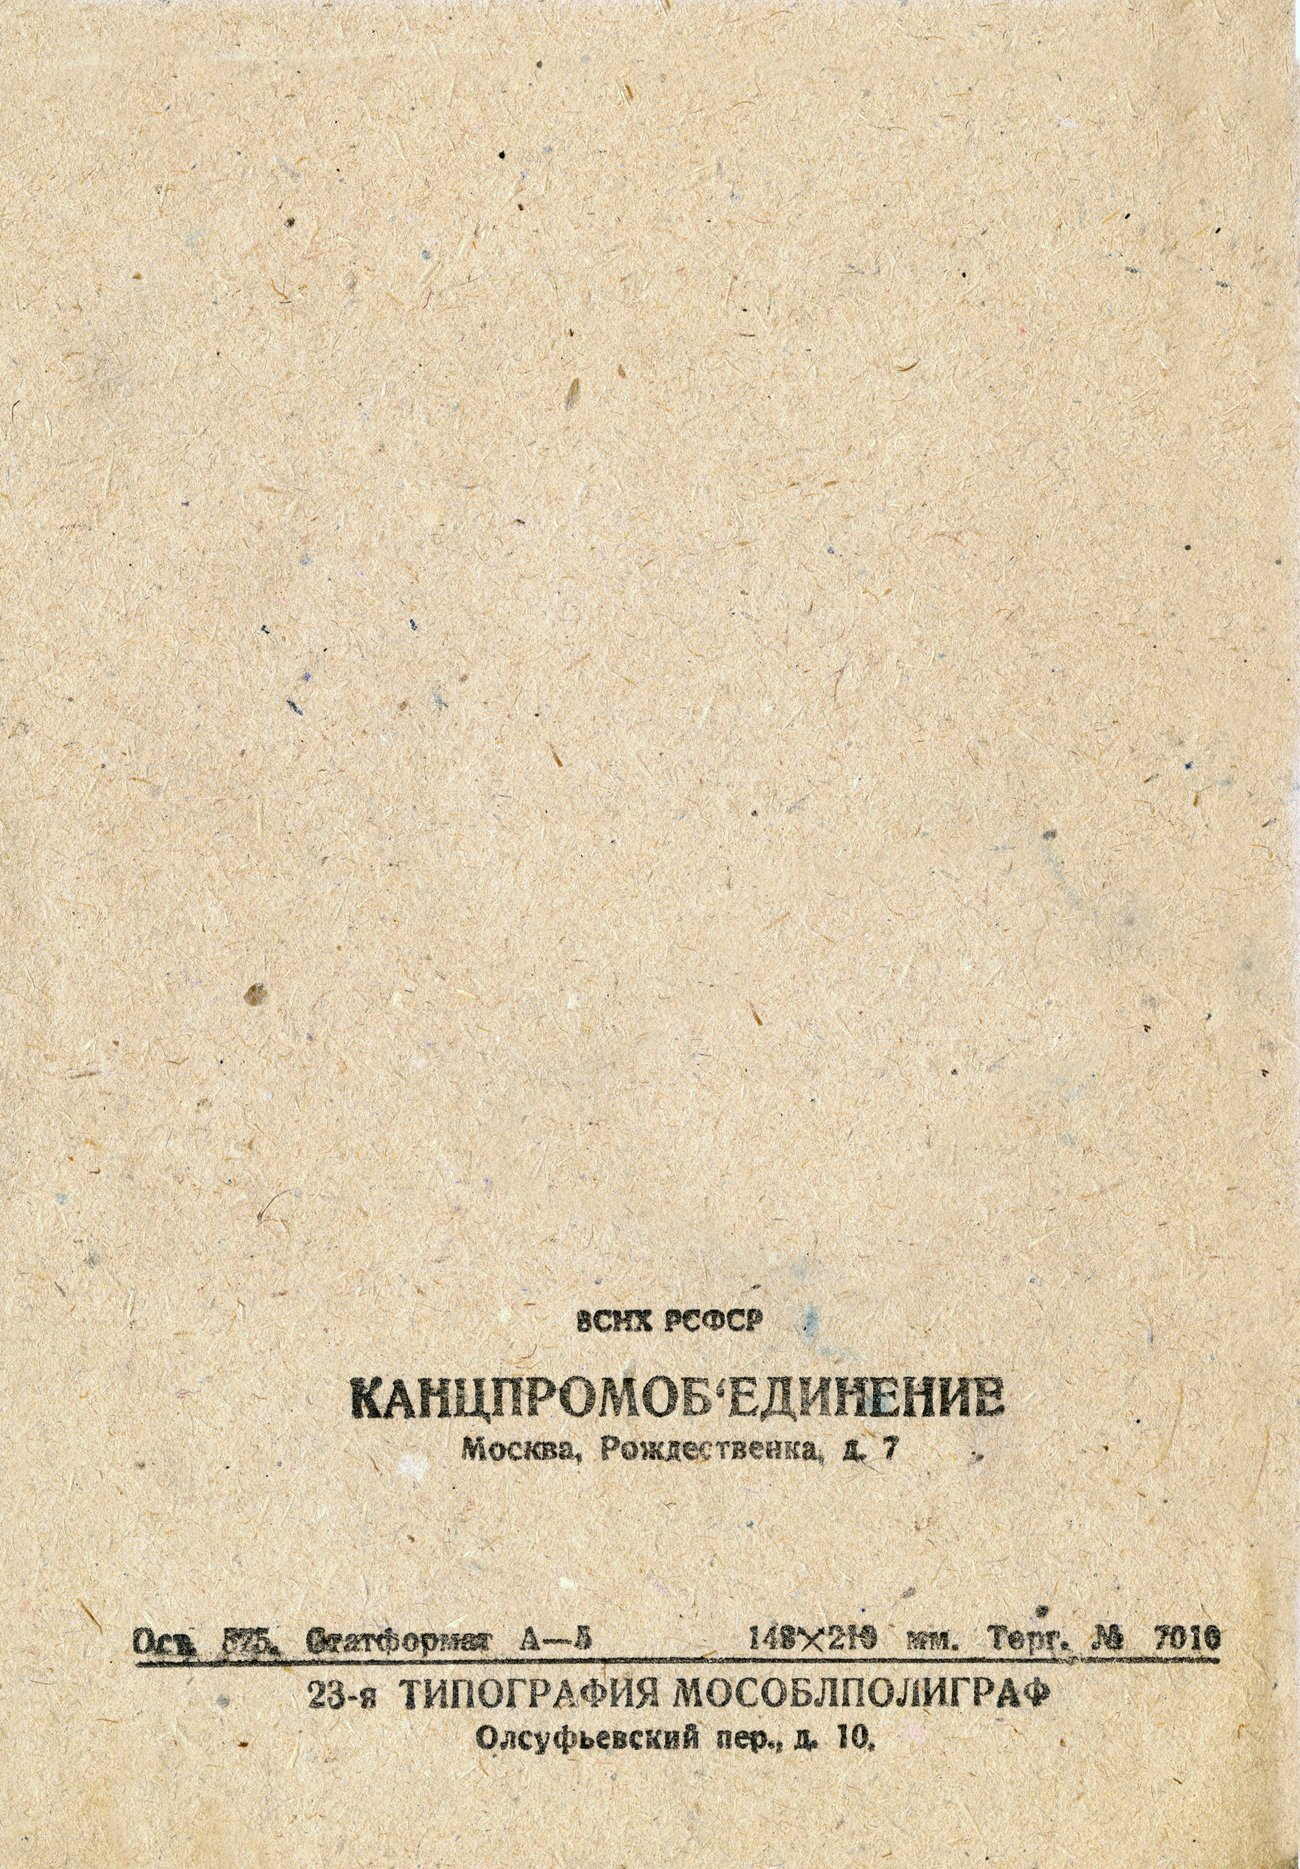 Тетрадь Канцпромобъединение, 148х210, оборот